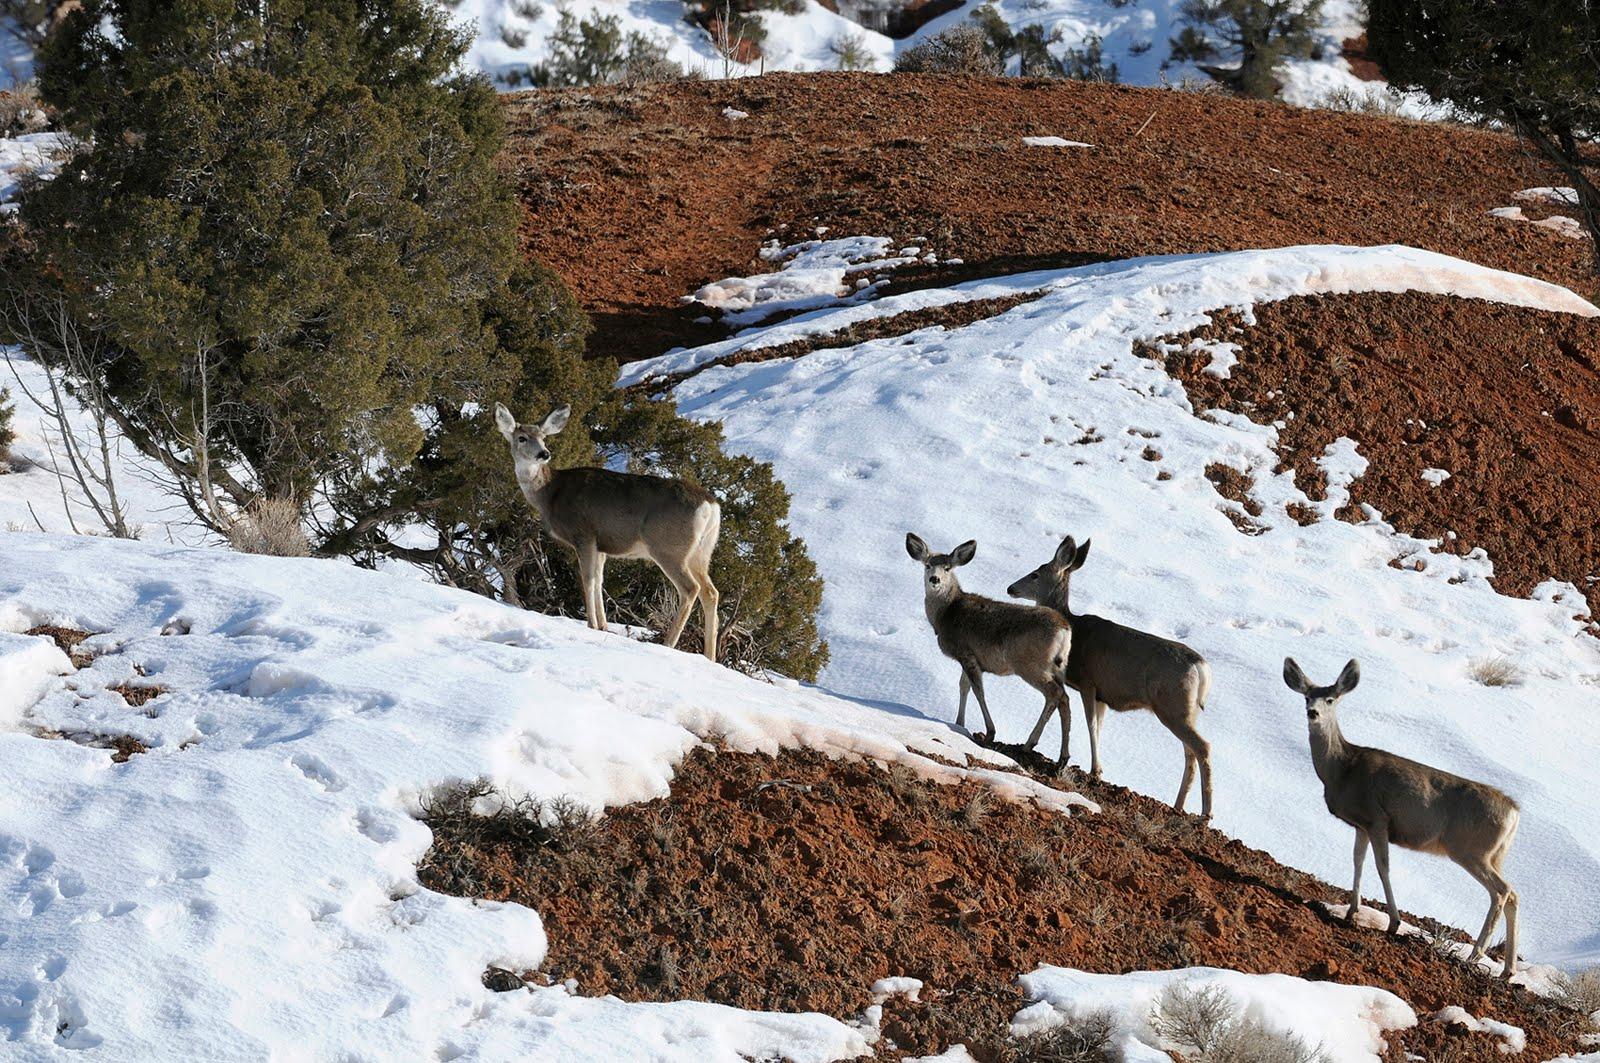 Backcountry utah 39 s outdoor adventure journal apply for for Utah fishing license cost